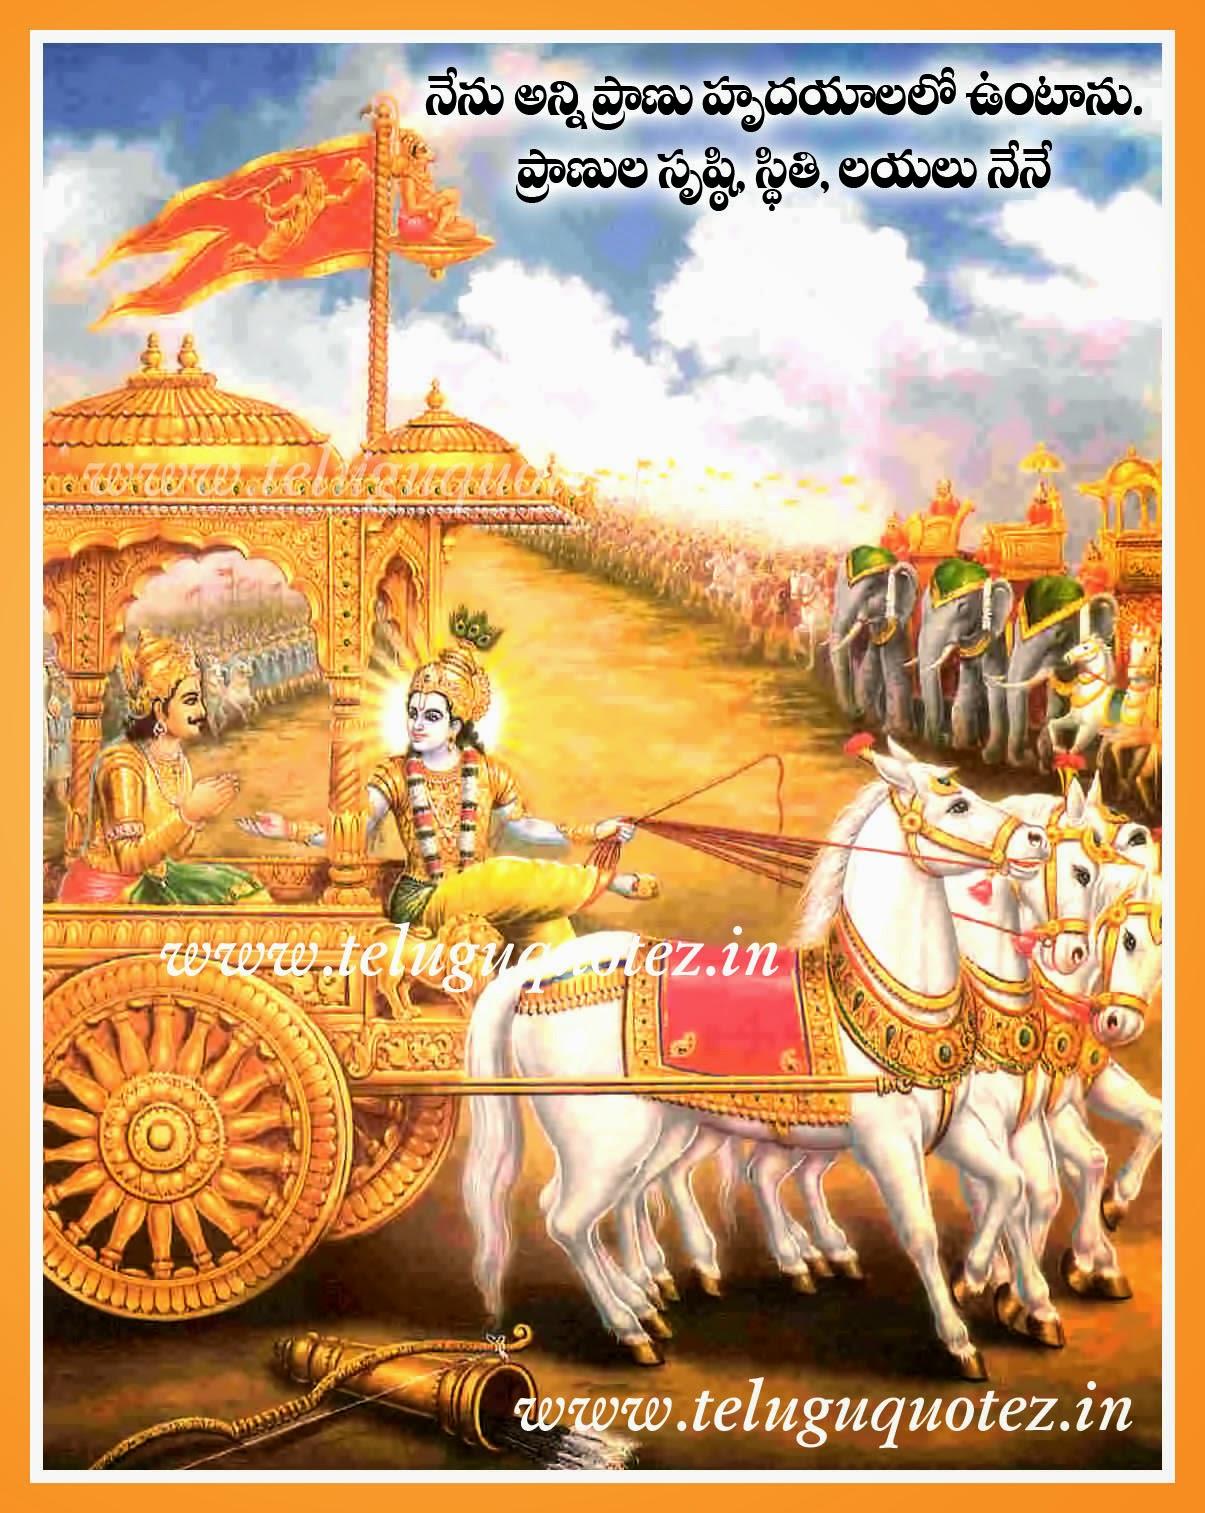 Bhagavad Gita Wallpapers Quotes In Tamil Labzada Wallpaper